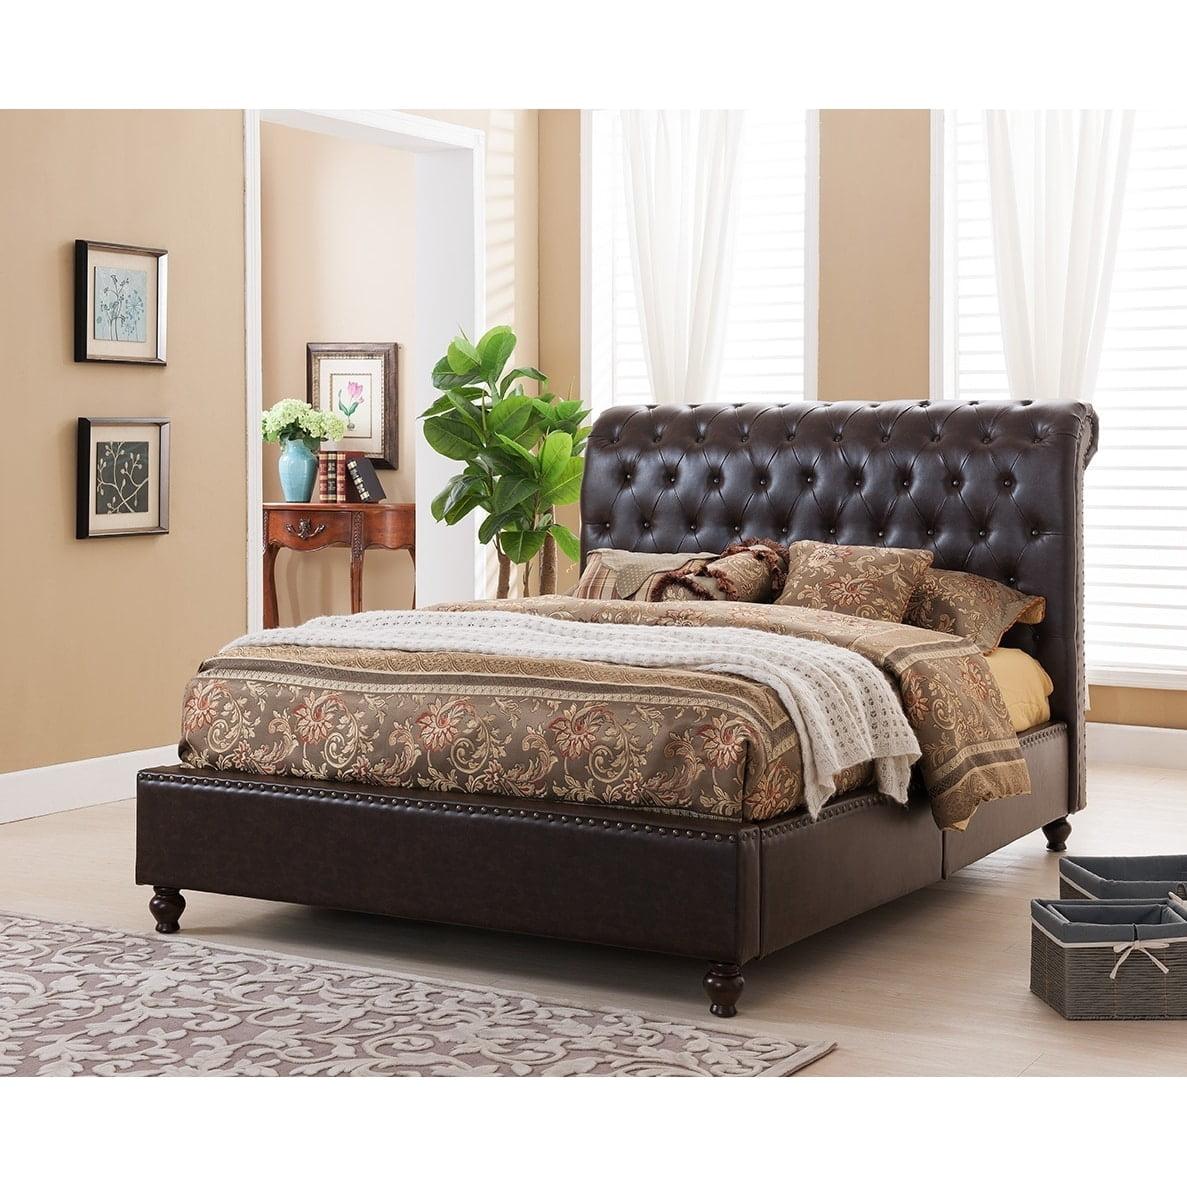 United Furniture Express Norman Tufted Modern Platform Bed with Upholstered Headboard